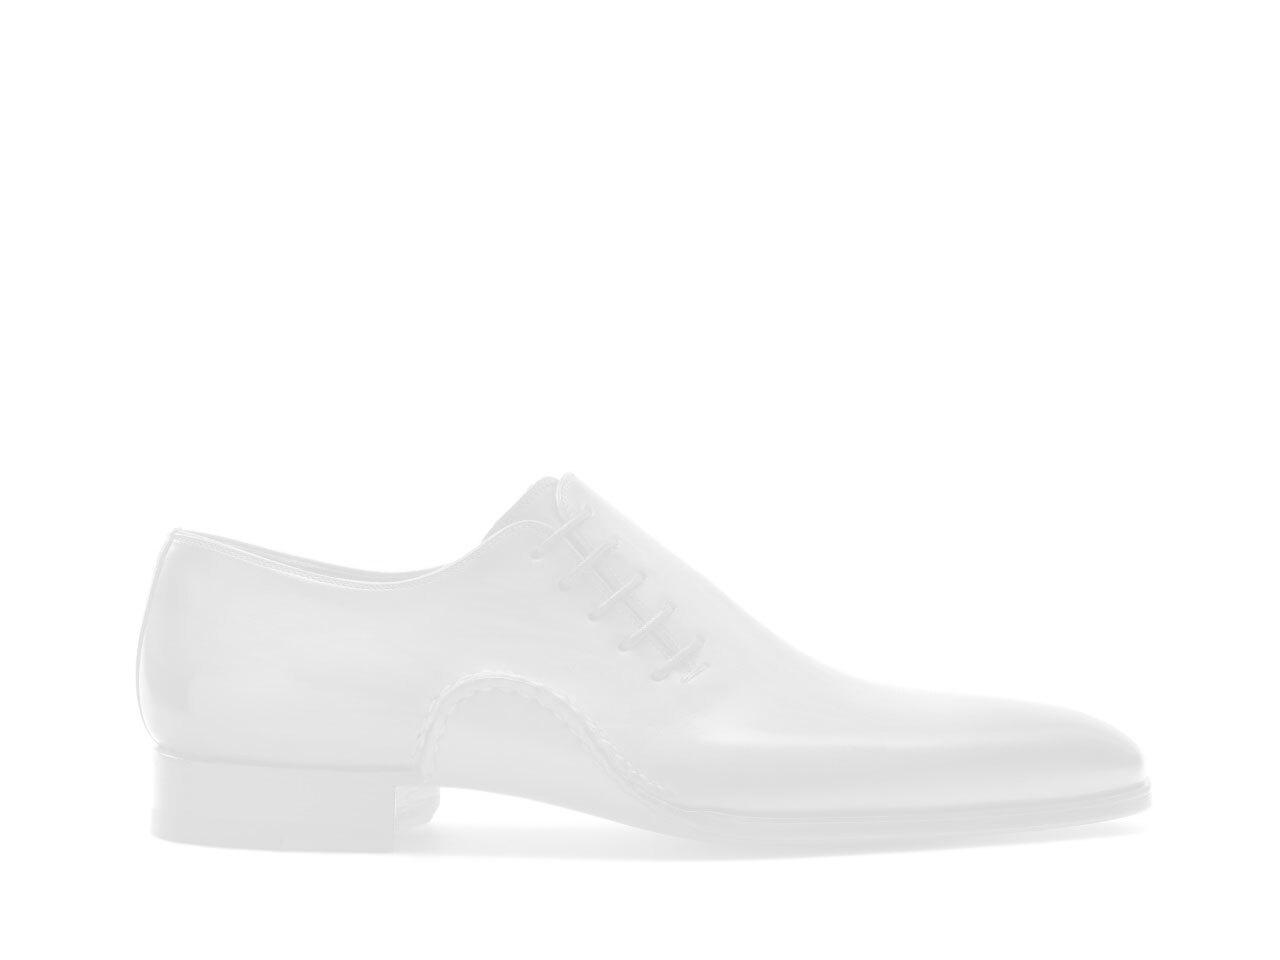 Pair of the Magnanni Stelvio Navy Men's Single Monk Strap Shoes